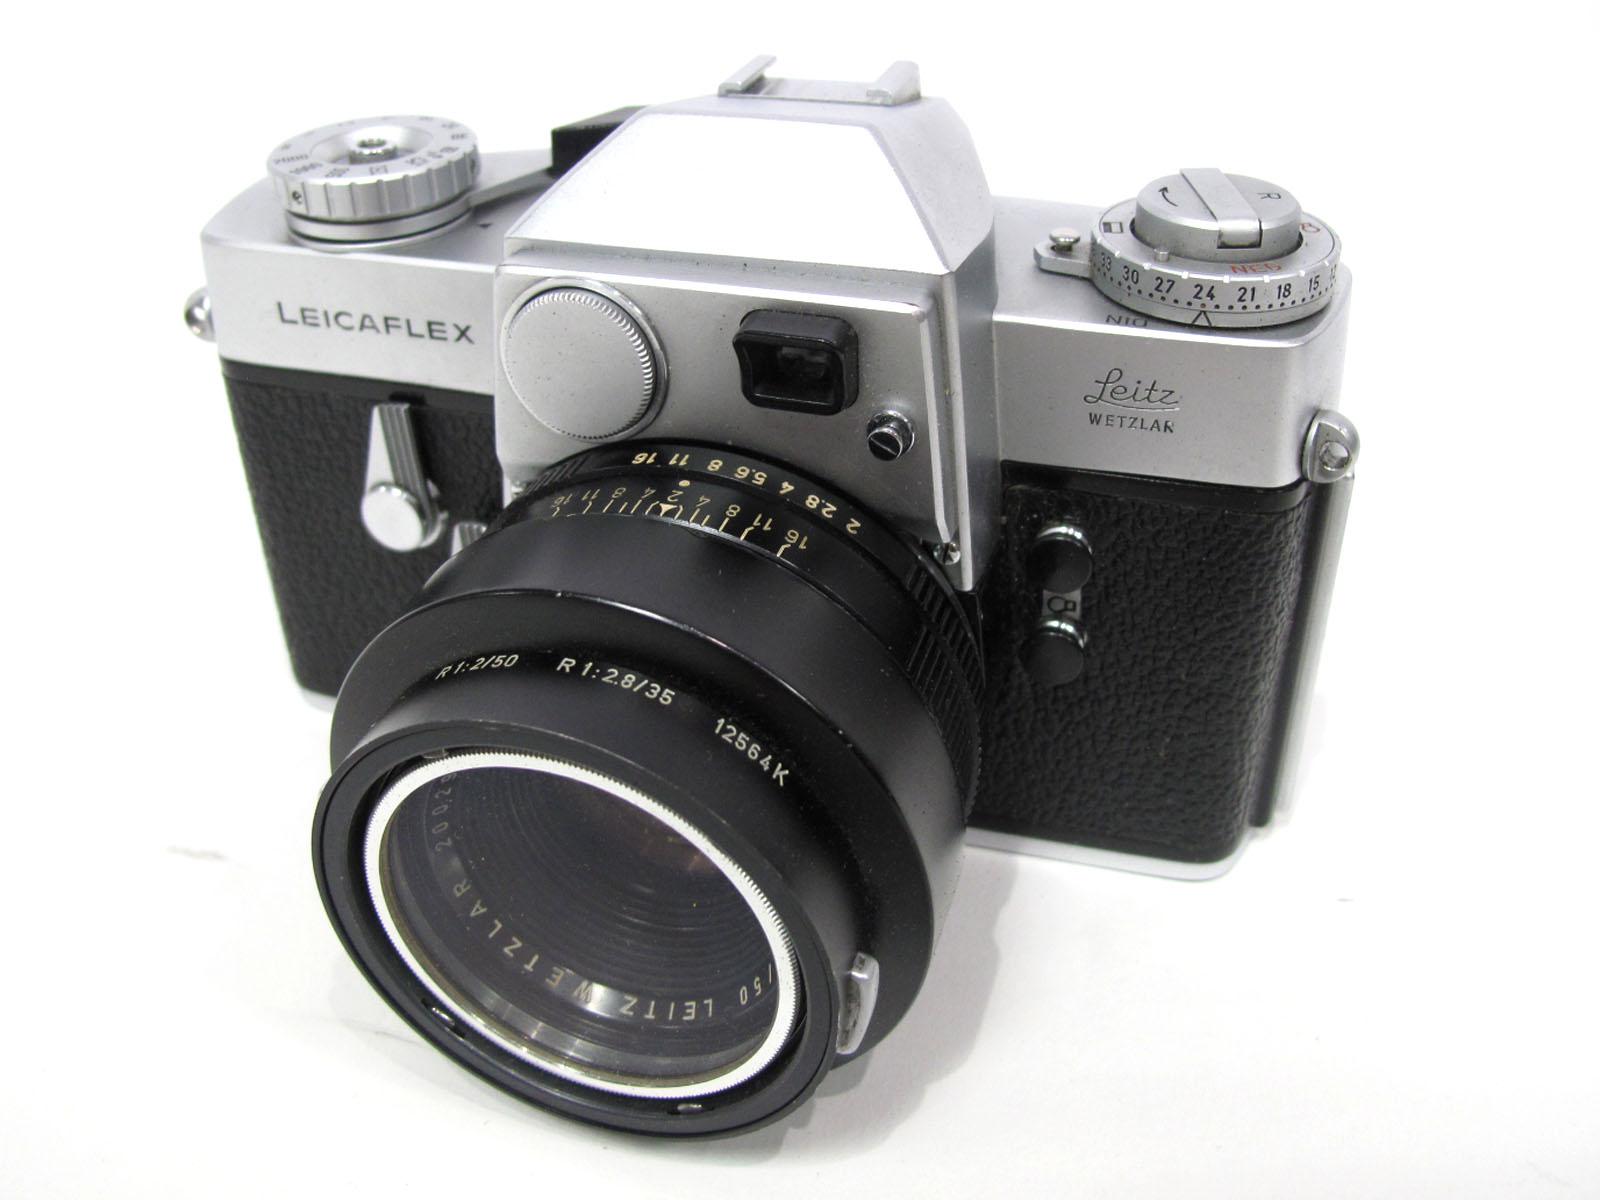 Leicaflex Manual Camera, with Leitz Wetzlar Summicron - R 1:2/50 lens in a black case.